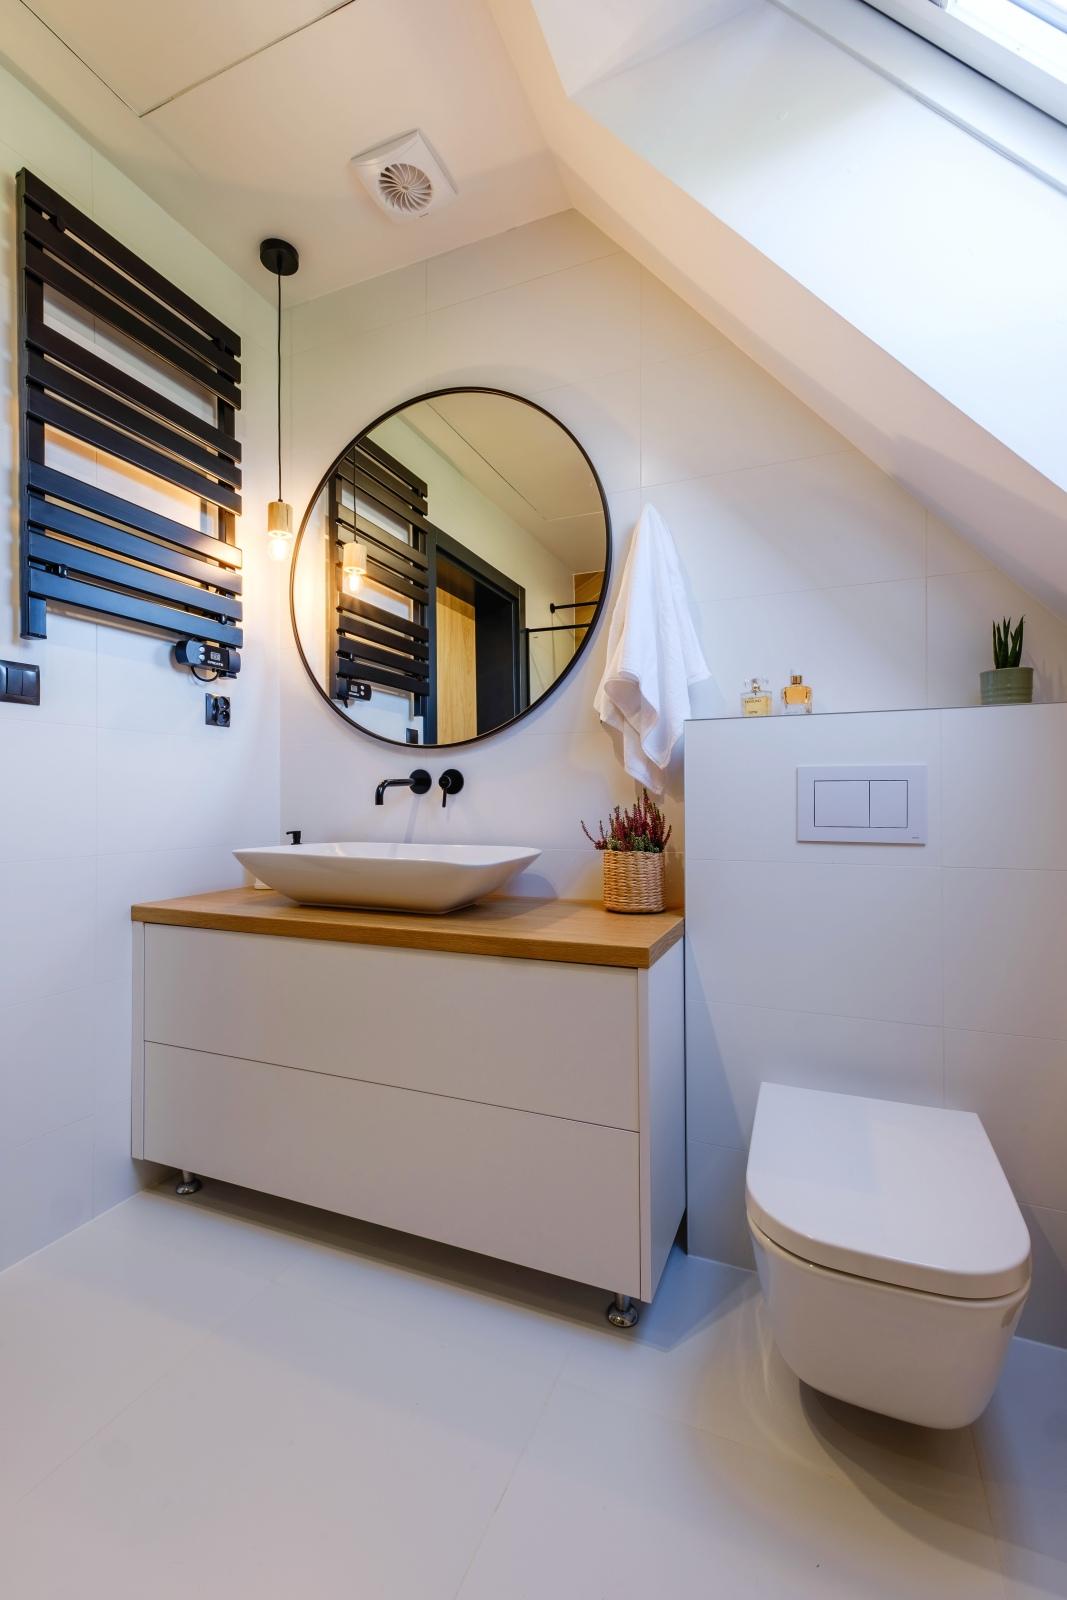 Apartamenty NOVA BIAŁKA Białka Tatrzańska apartament 8 łazienka 2